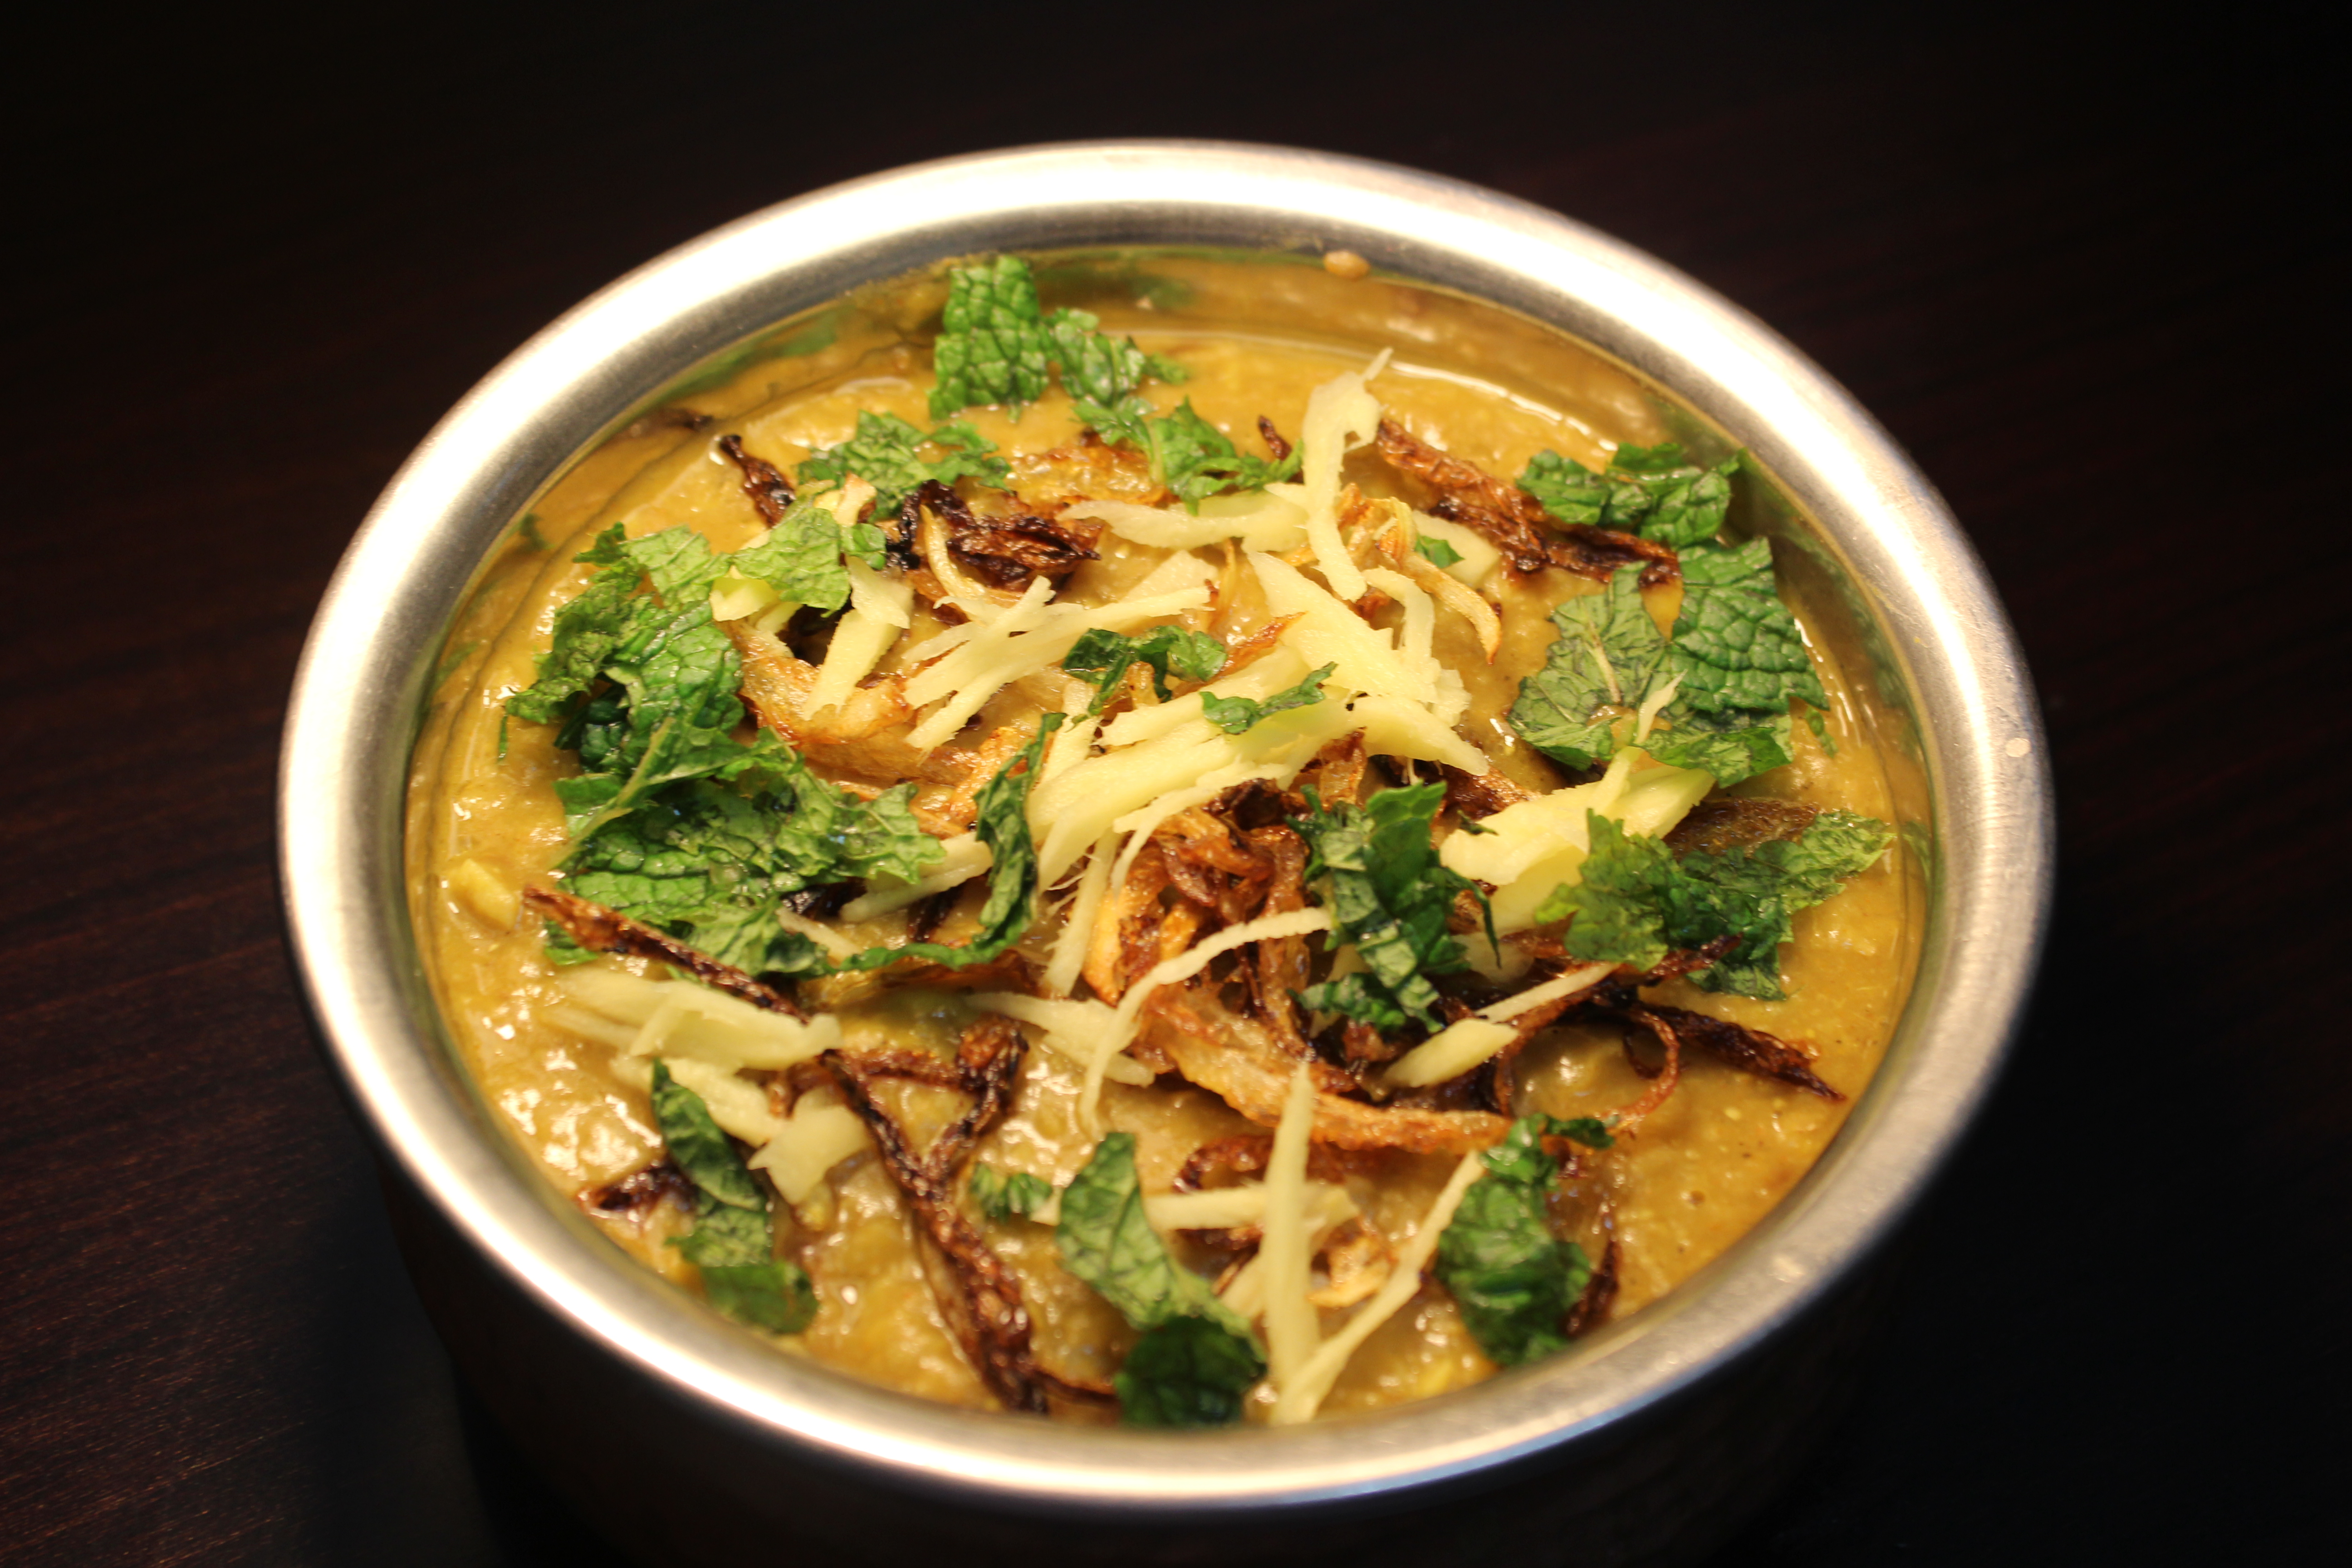 Haleem bangladeshi style khadizas kitchen forumfinder Image collections